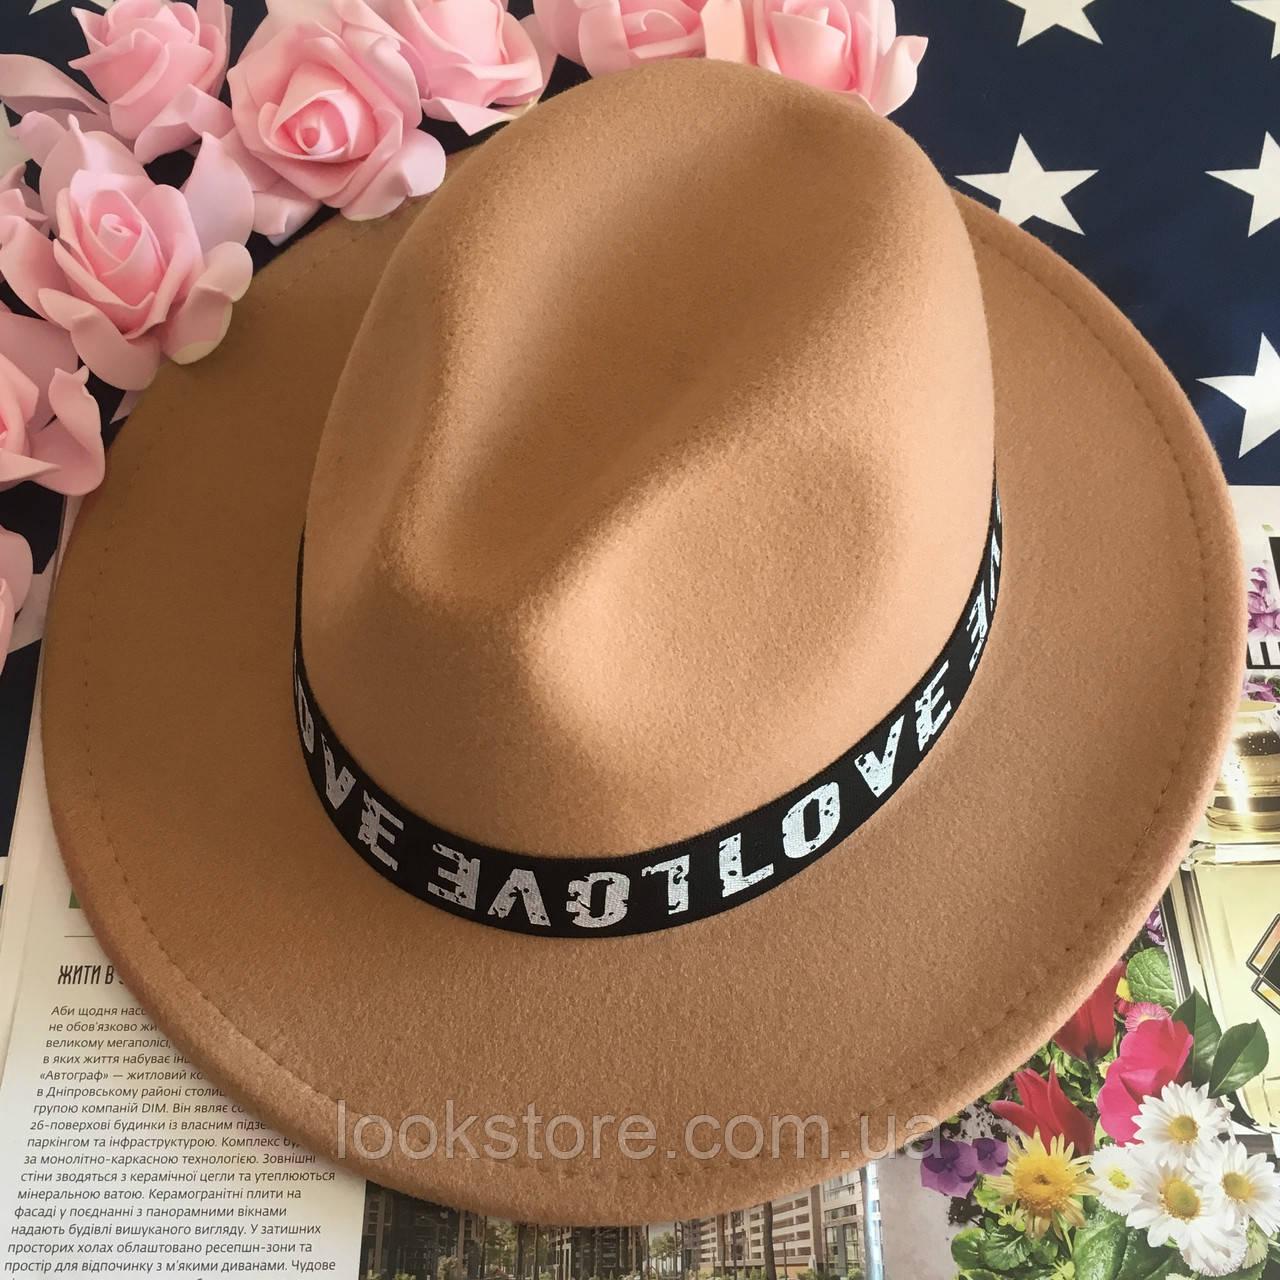 Шляпа Федора унисекс с устойчивыми полями Love бежевая